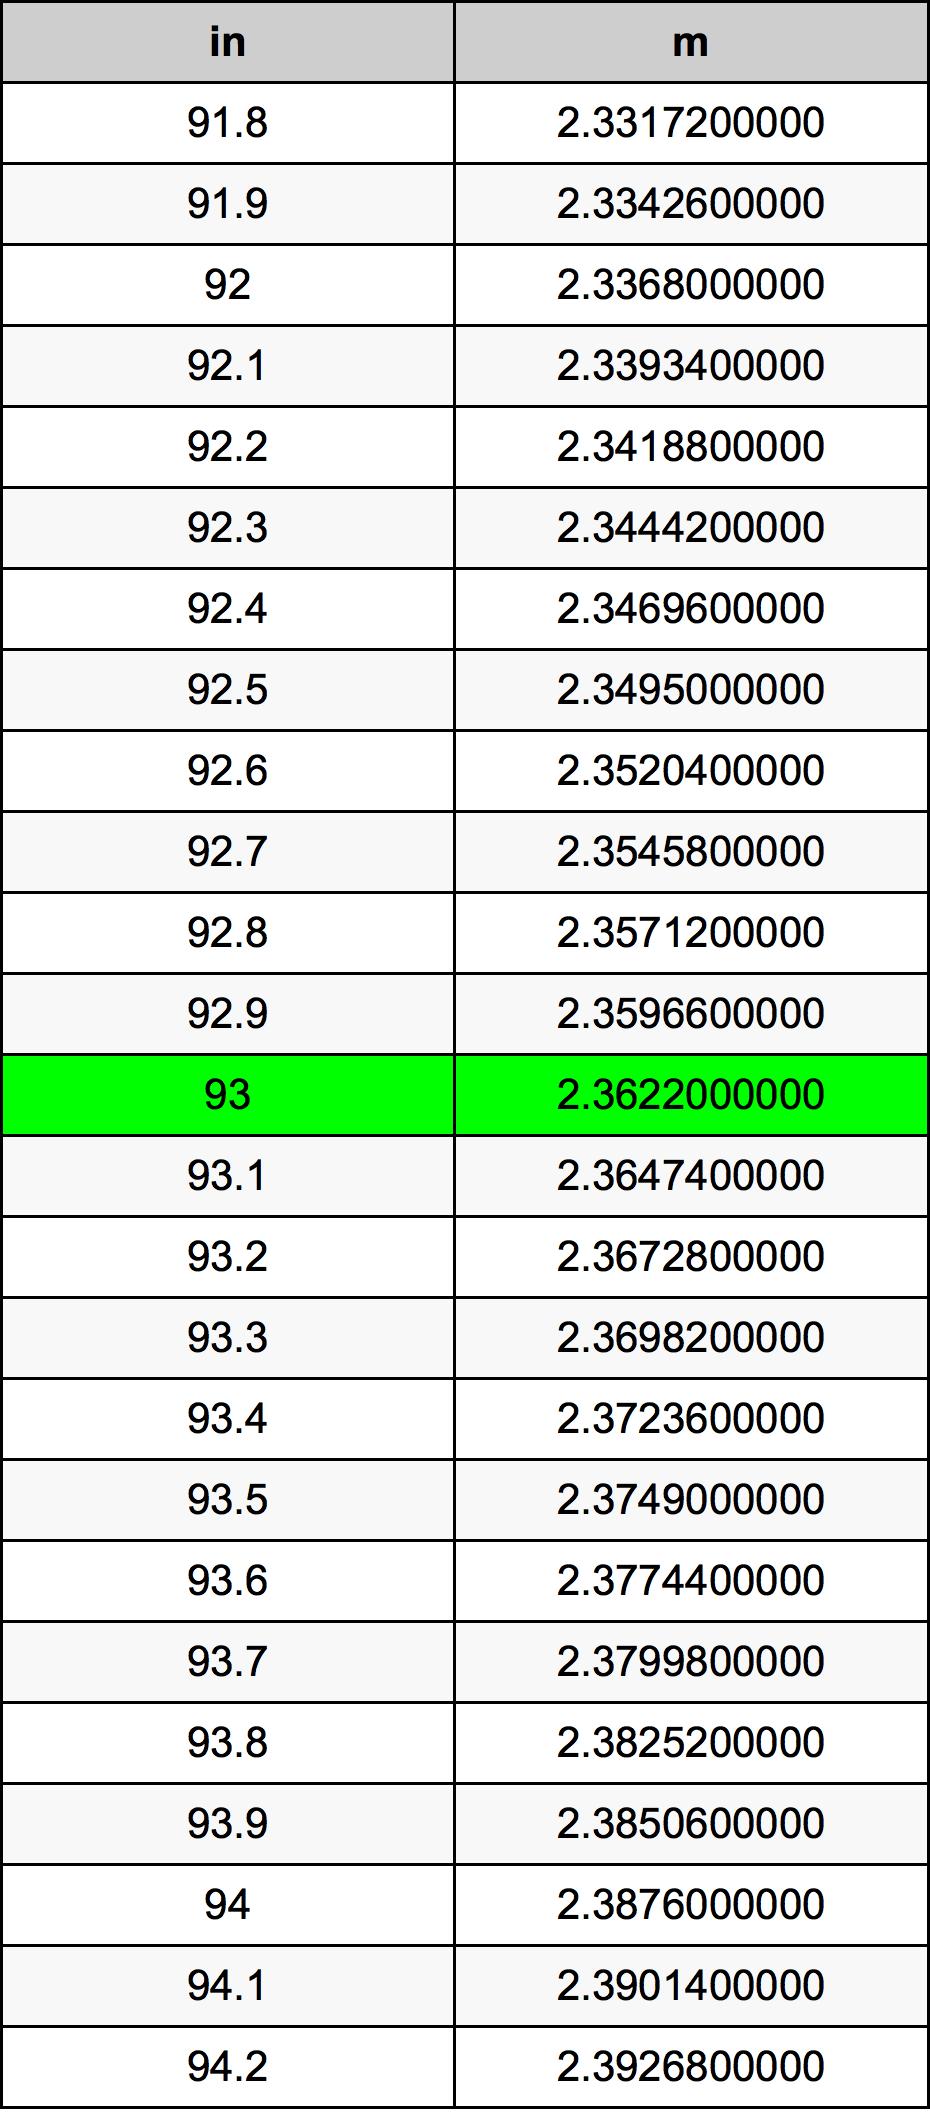 93 Inch konverteringstabell